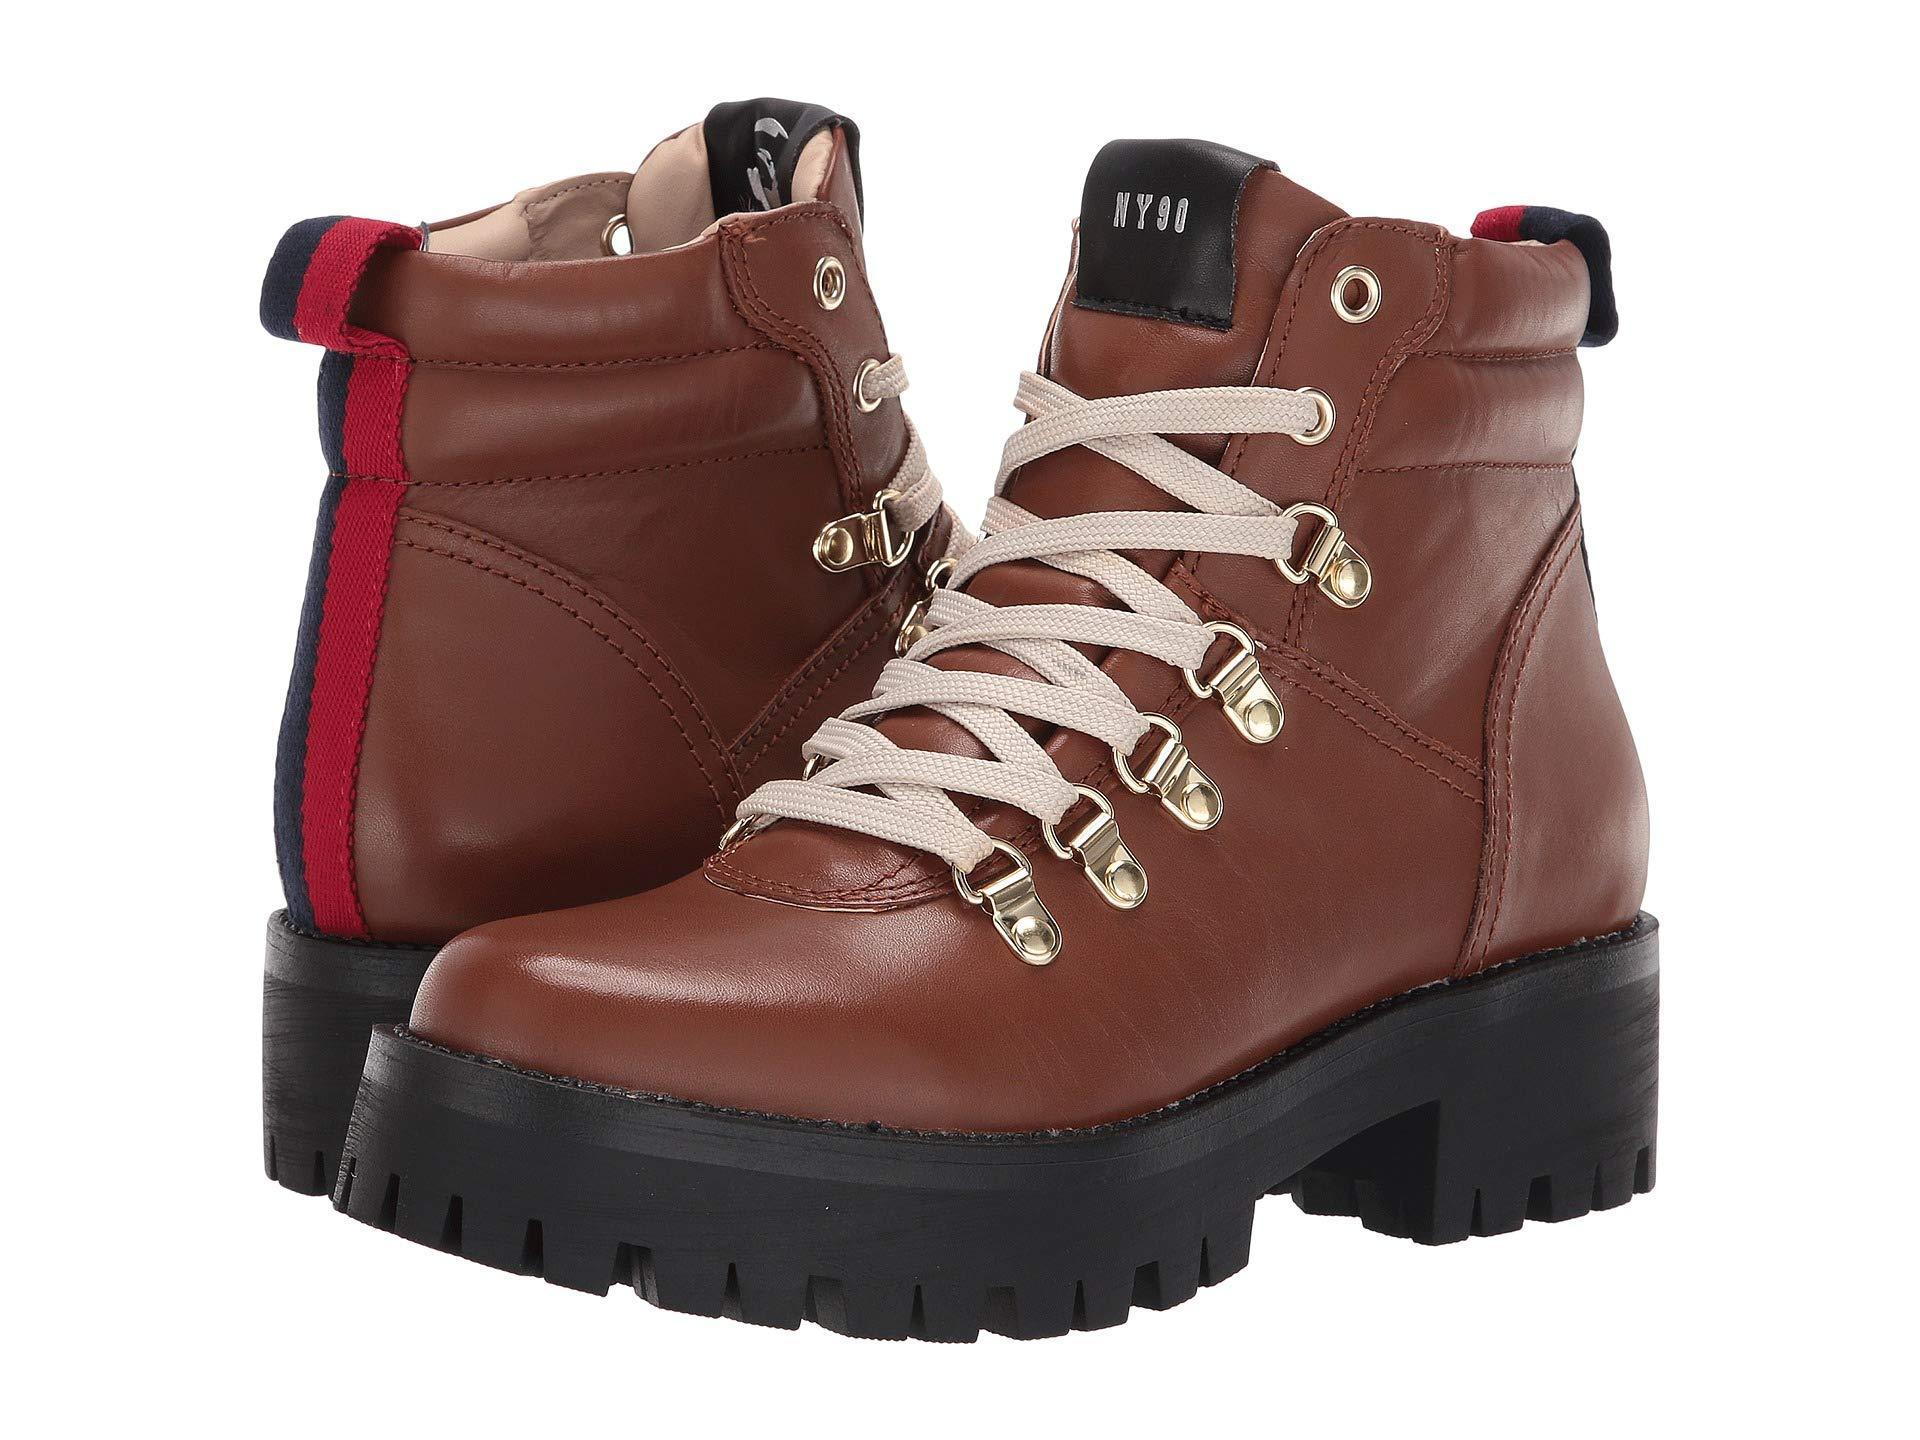 bd7cb7487f7 Lyst - Steve Madden Buzzer Hiker Boot in Brown - Save 36%